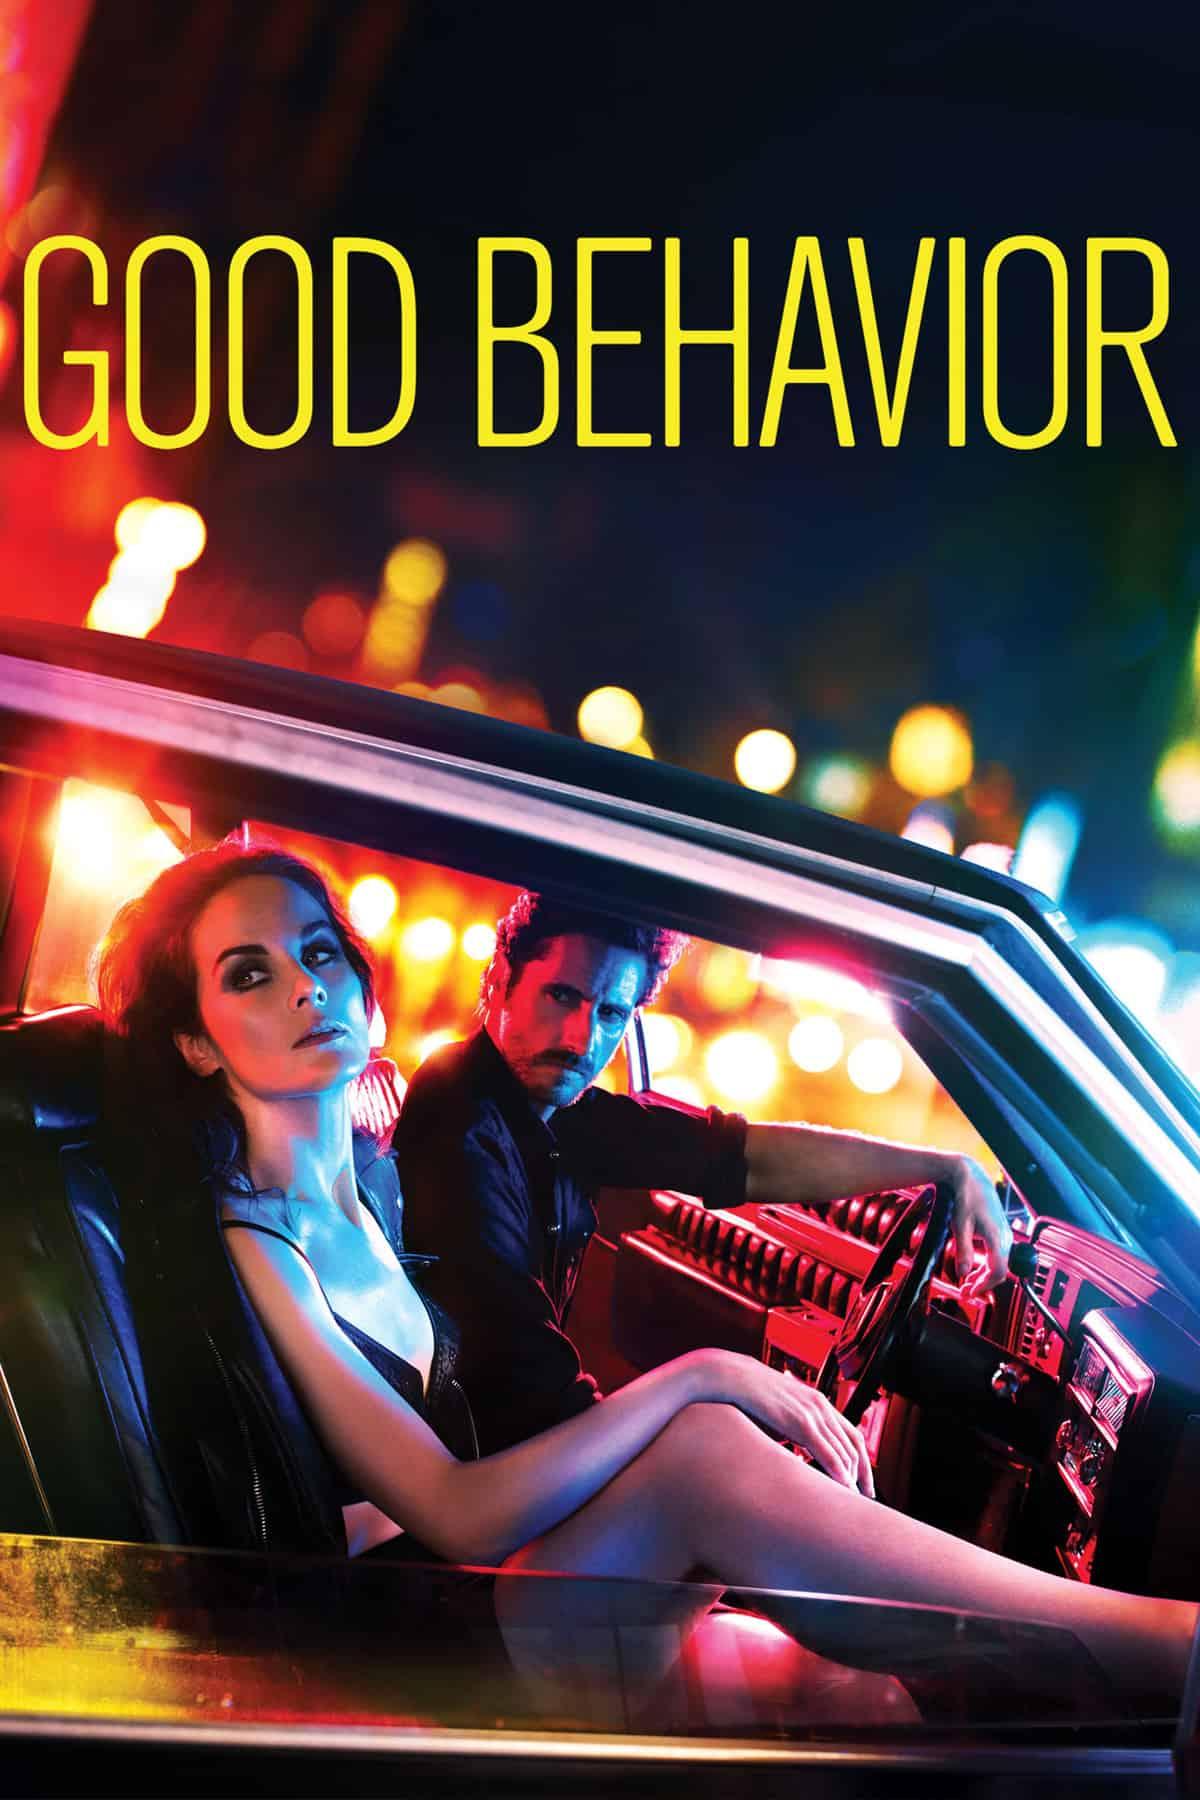 Good Behavior, 2016